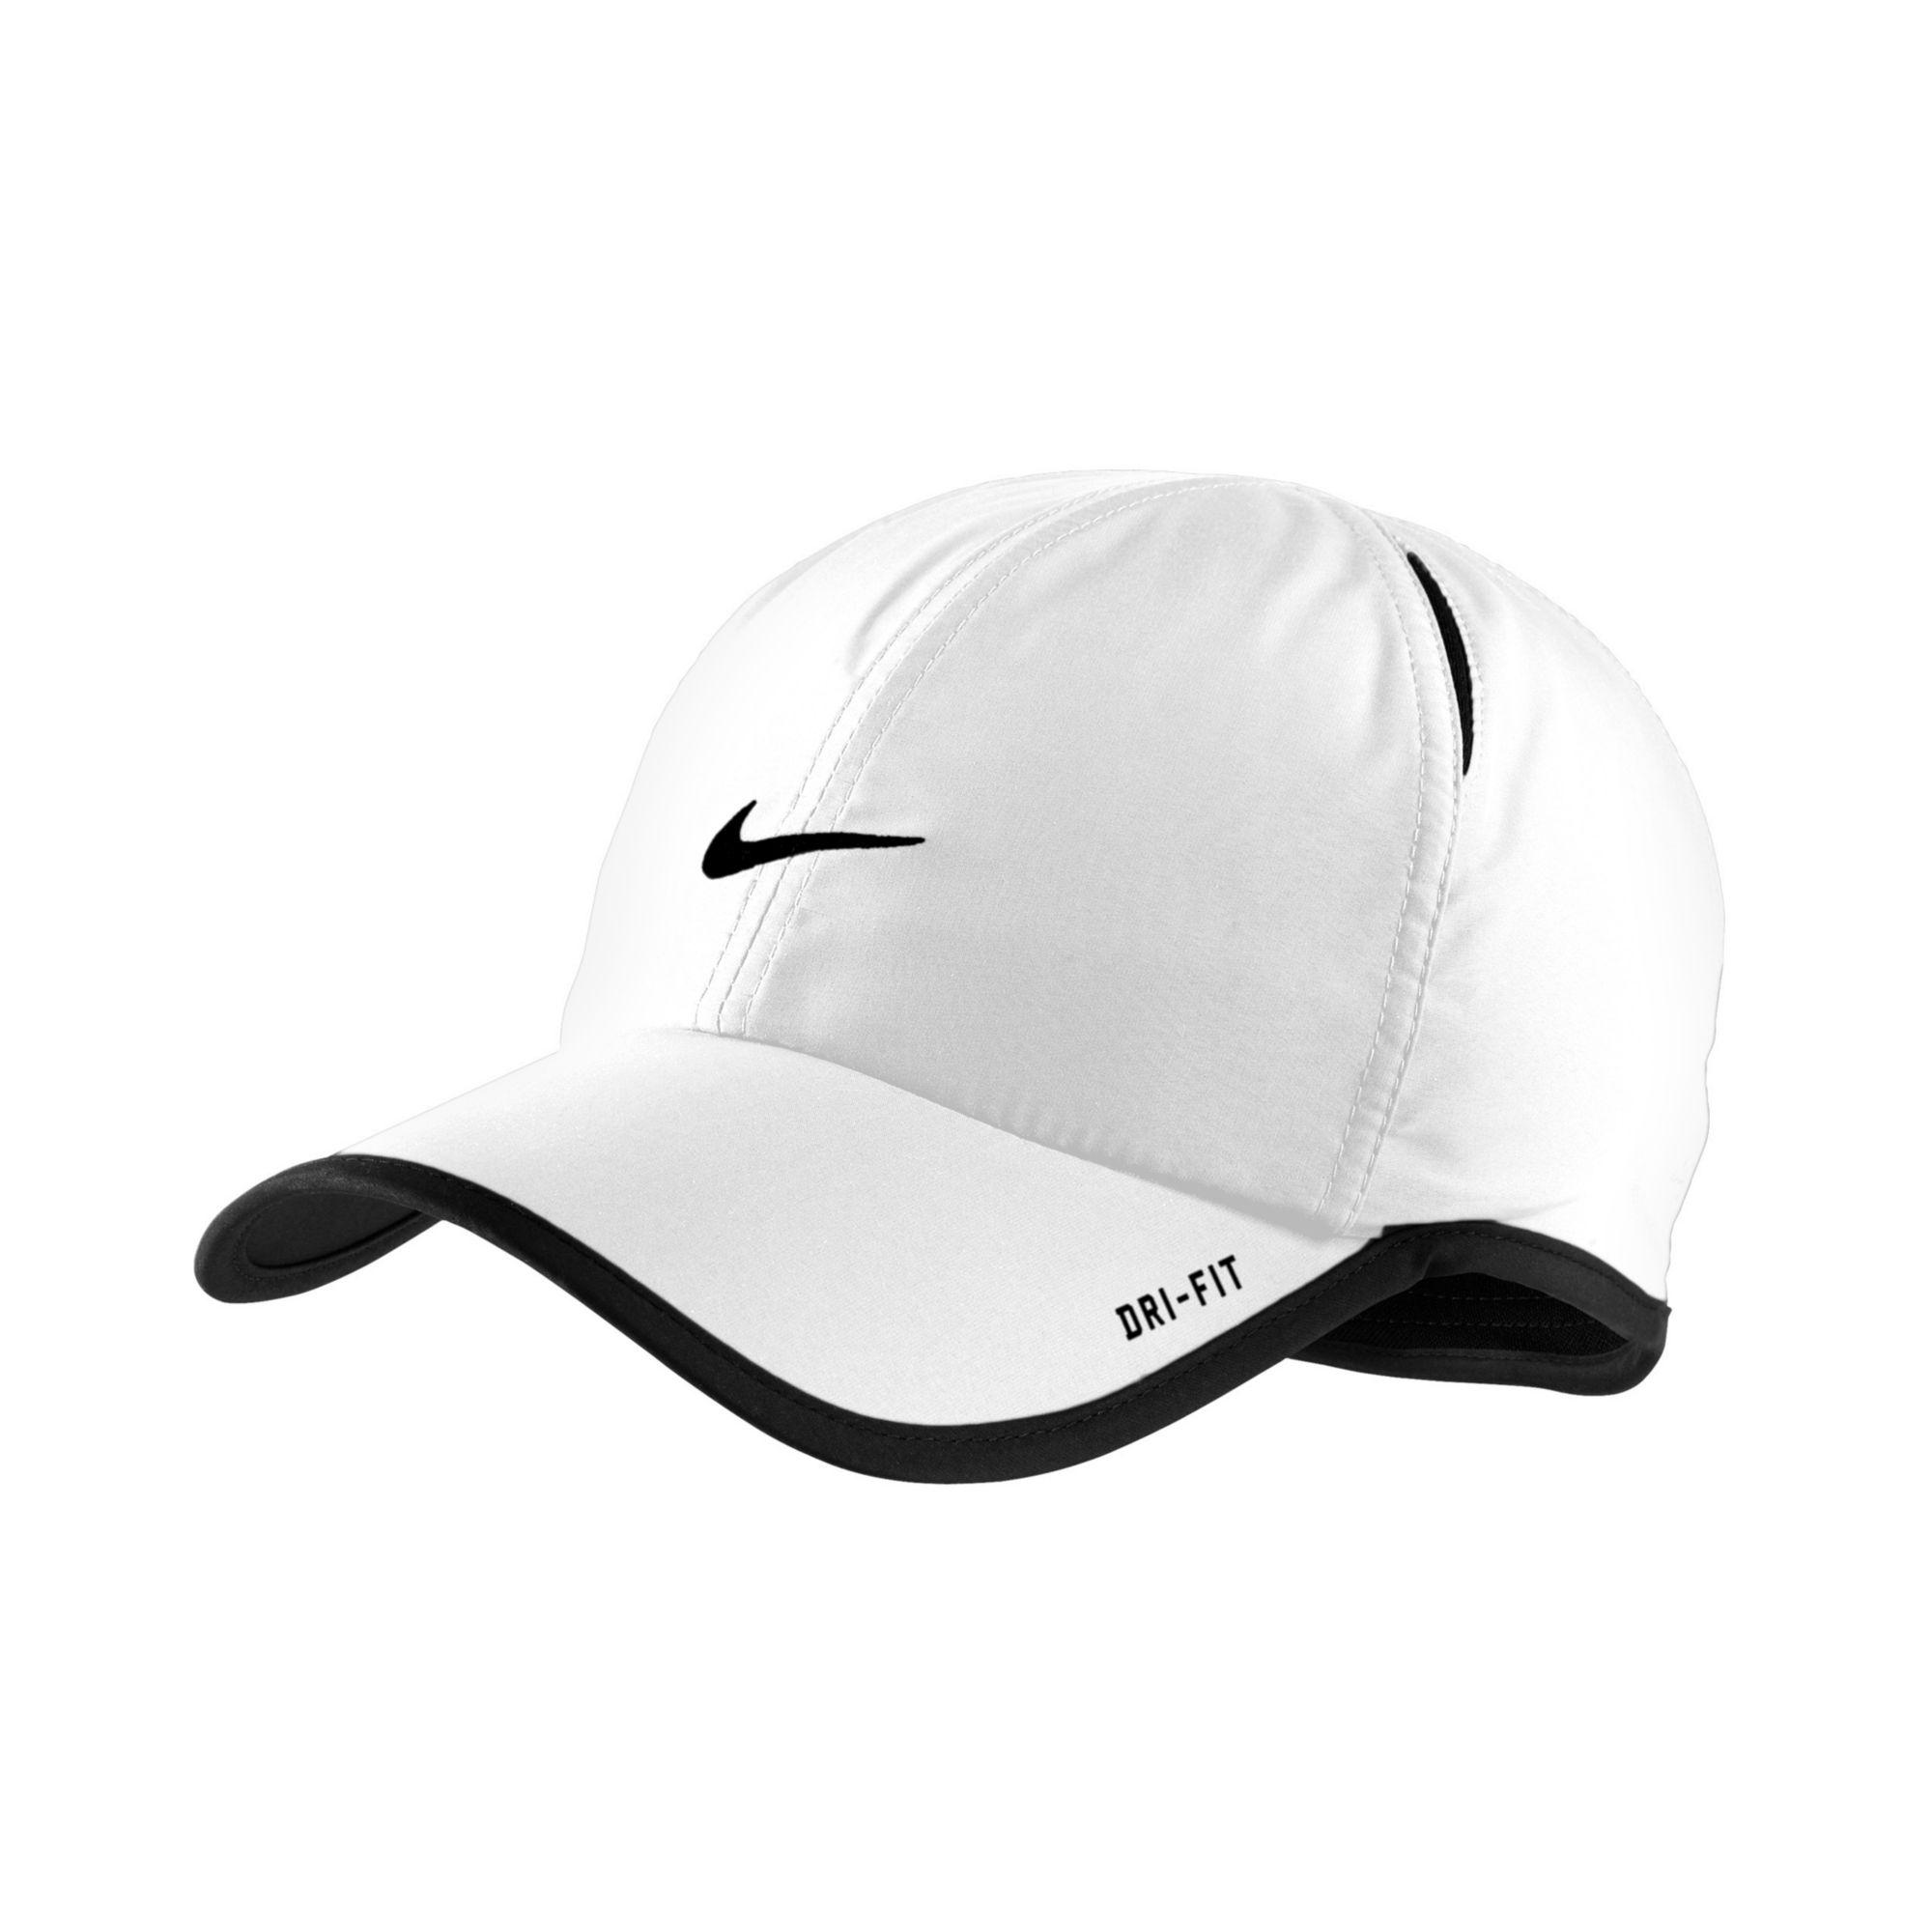 nike featherlight cap; nike cap black and white featherlight